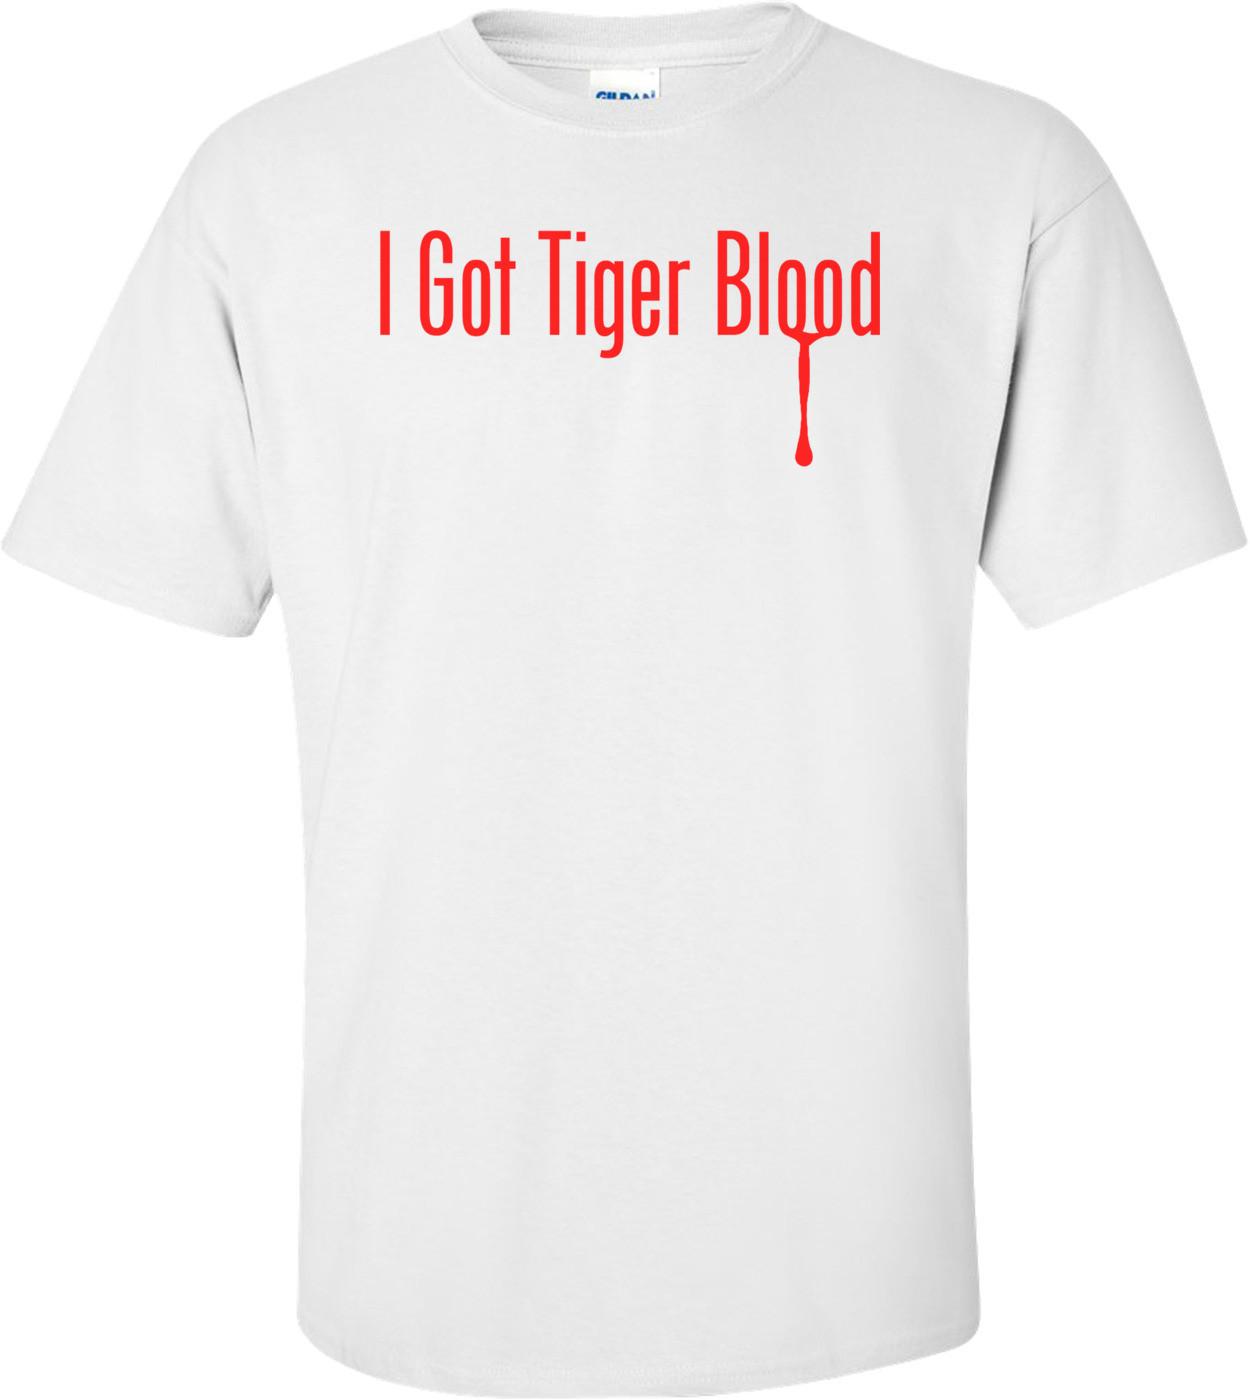 I Got Tiger Blood - Charlie Sheen Shirt